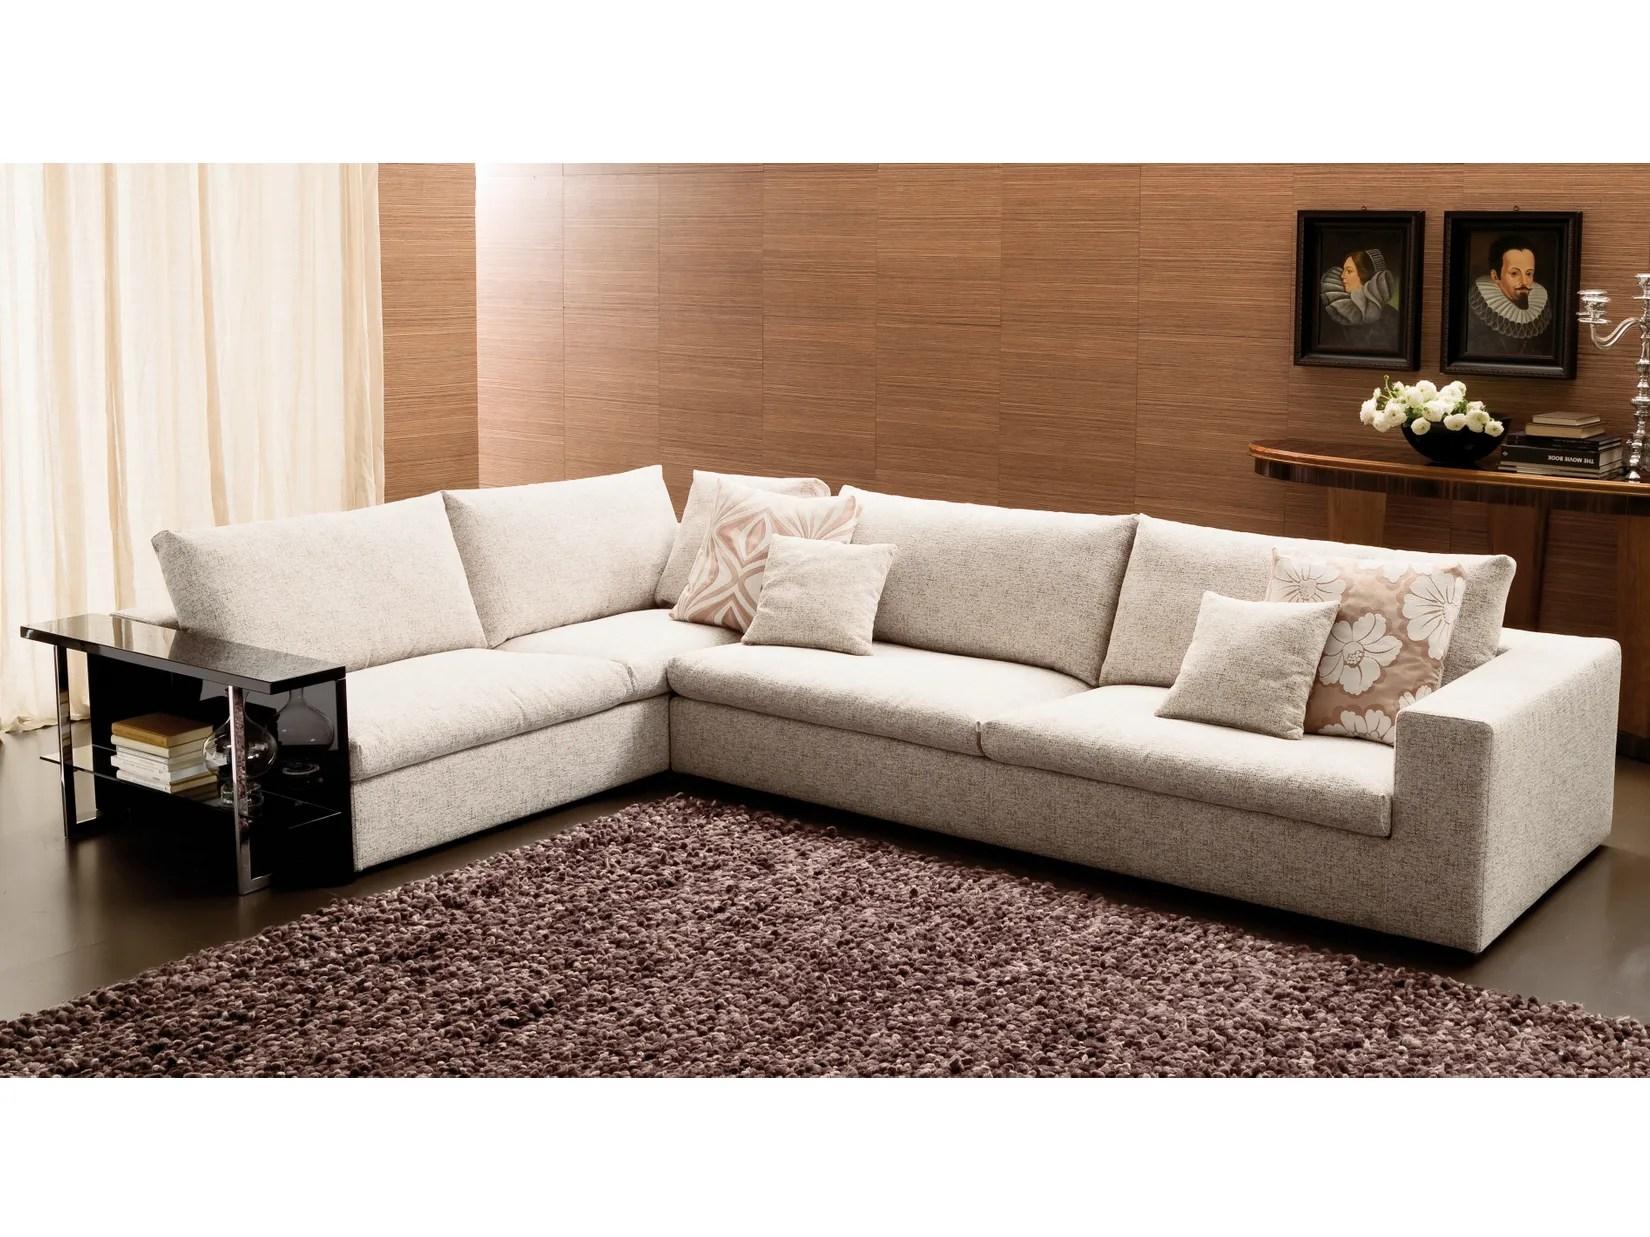 corner sofa cover design coaster leather sectional lazar by bontempi casa carlo bimbi